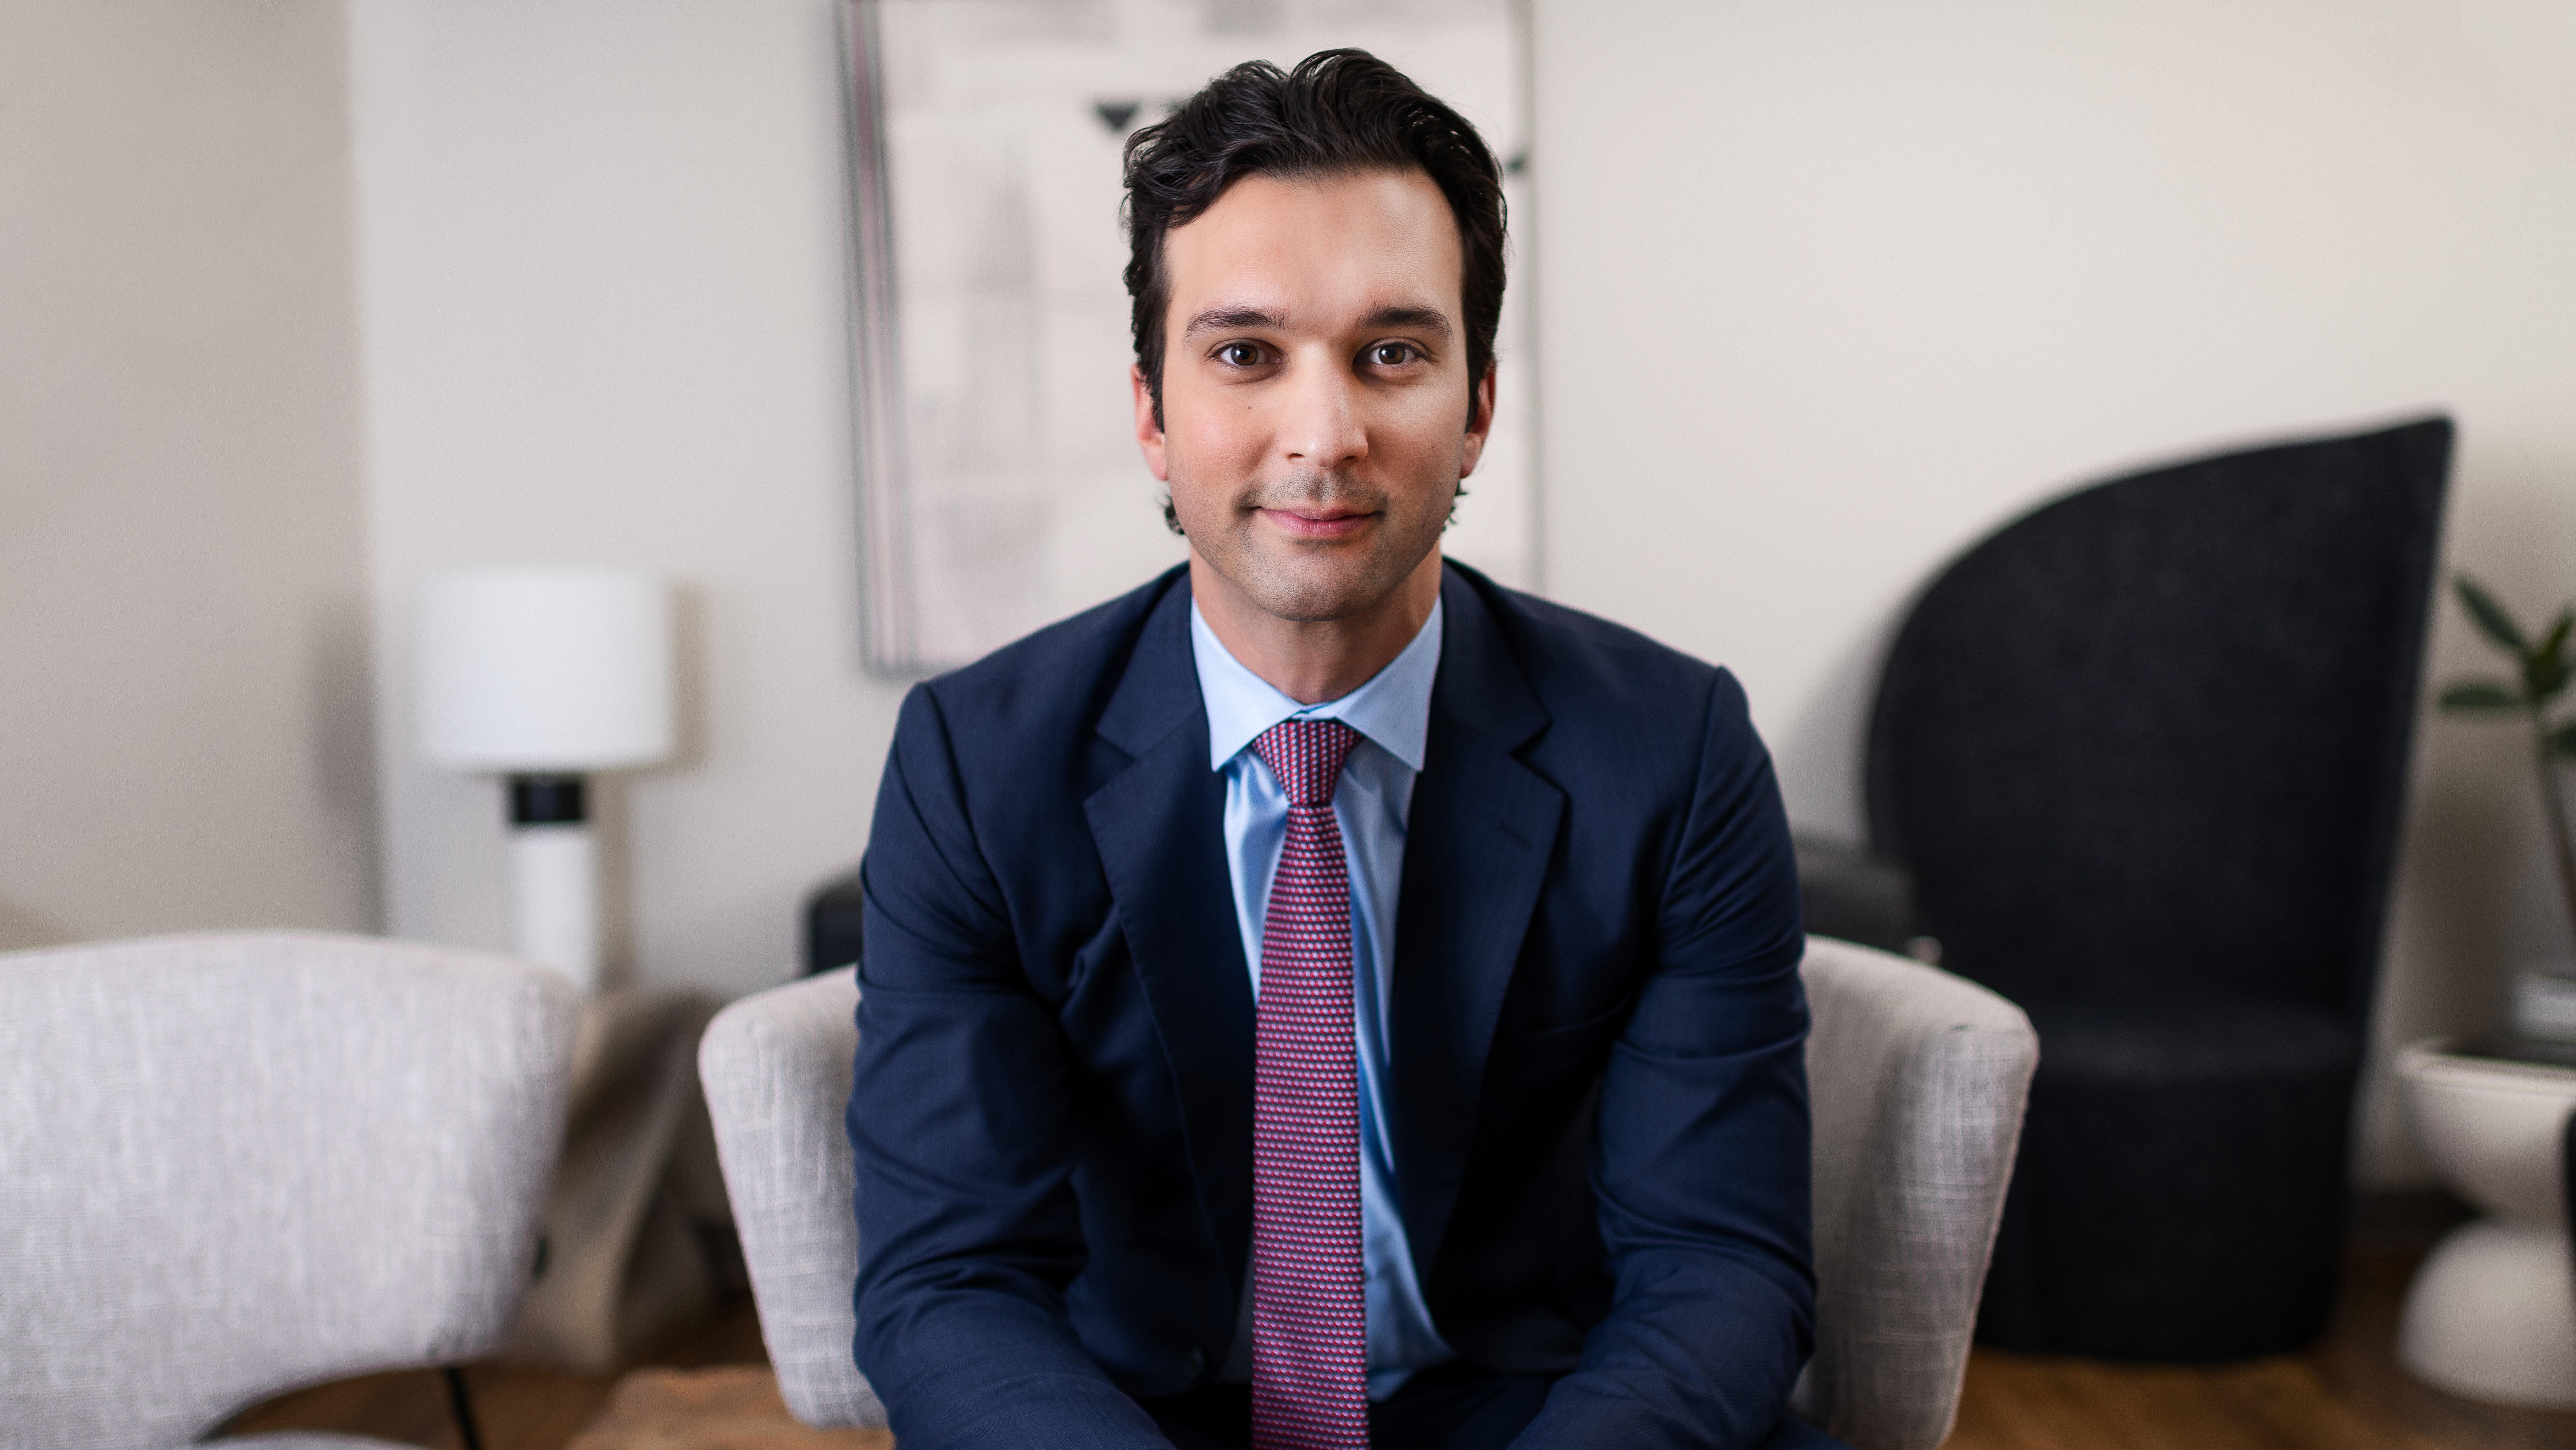 Dallas Plastic Surgeon Dr. Jordan Rihani Reveals How Social Media Has Affected the Aesthetics Industry